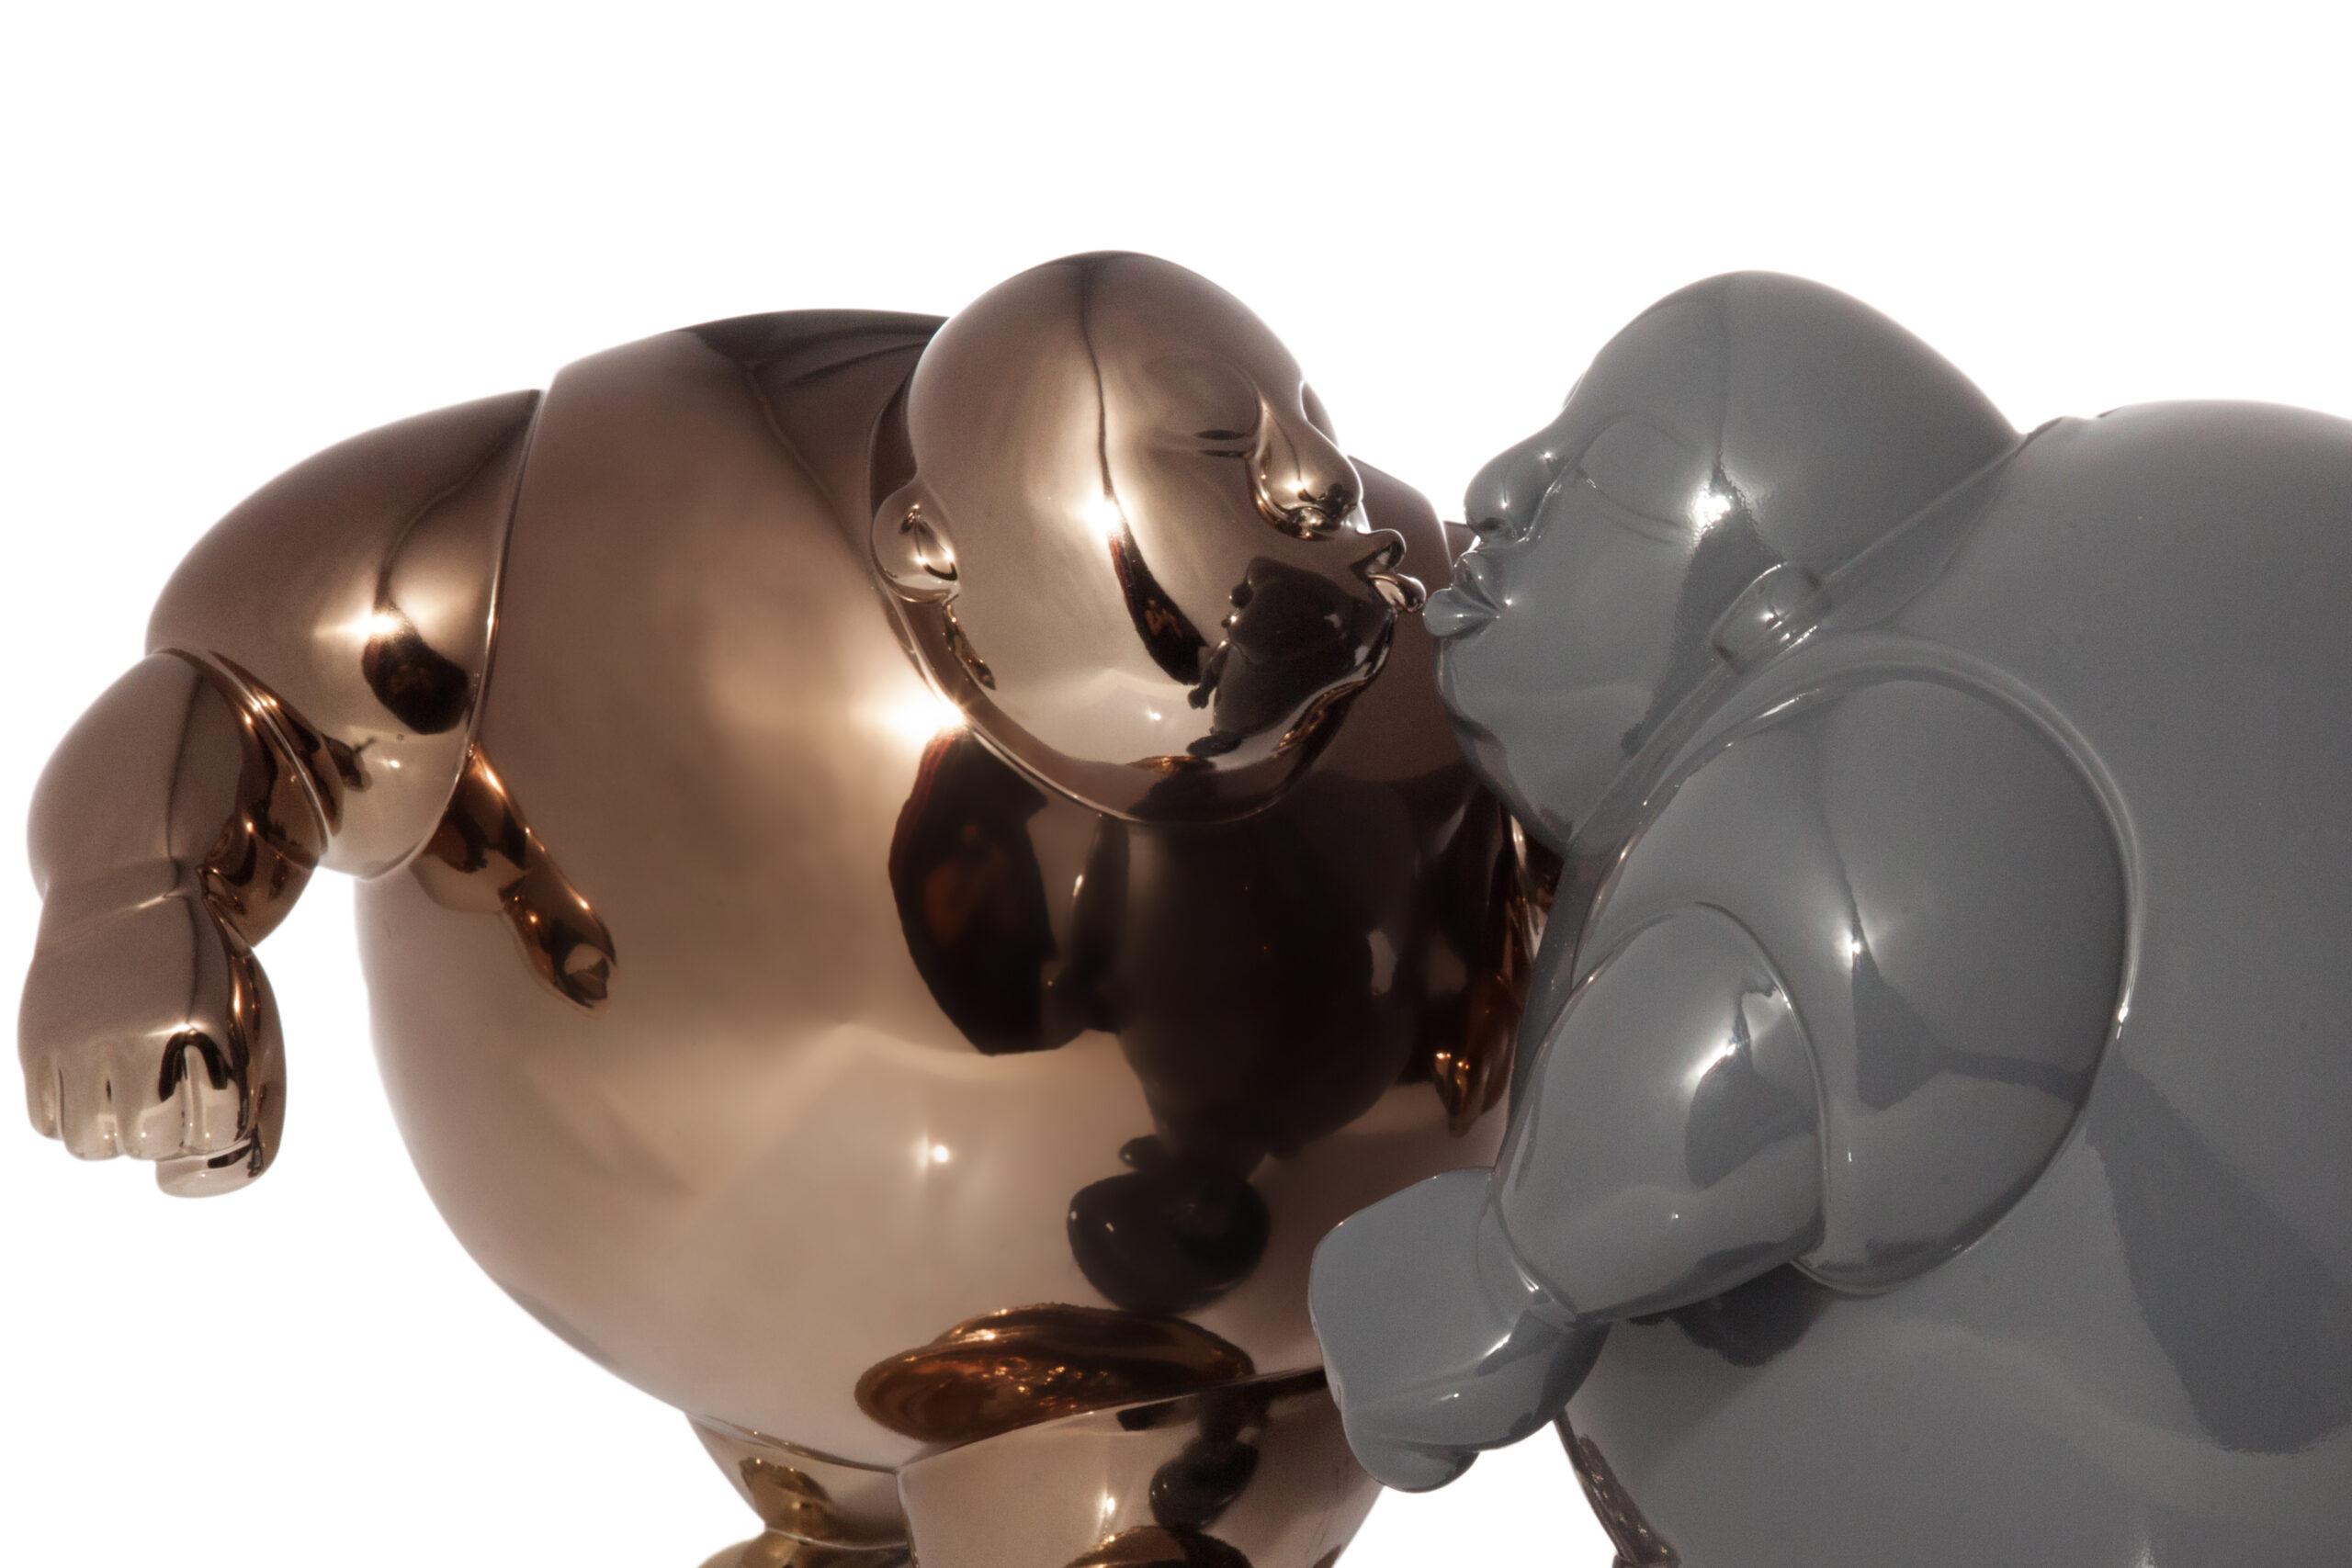 kiss-compound-materials-